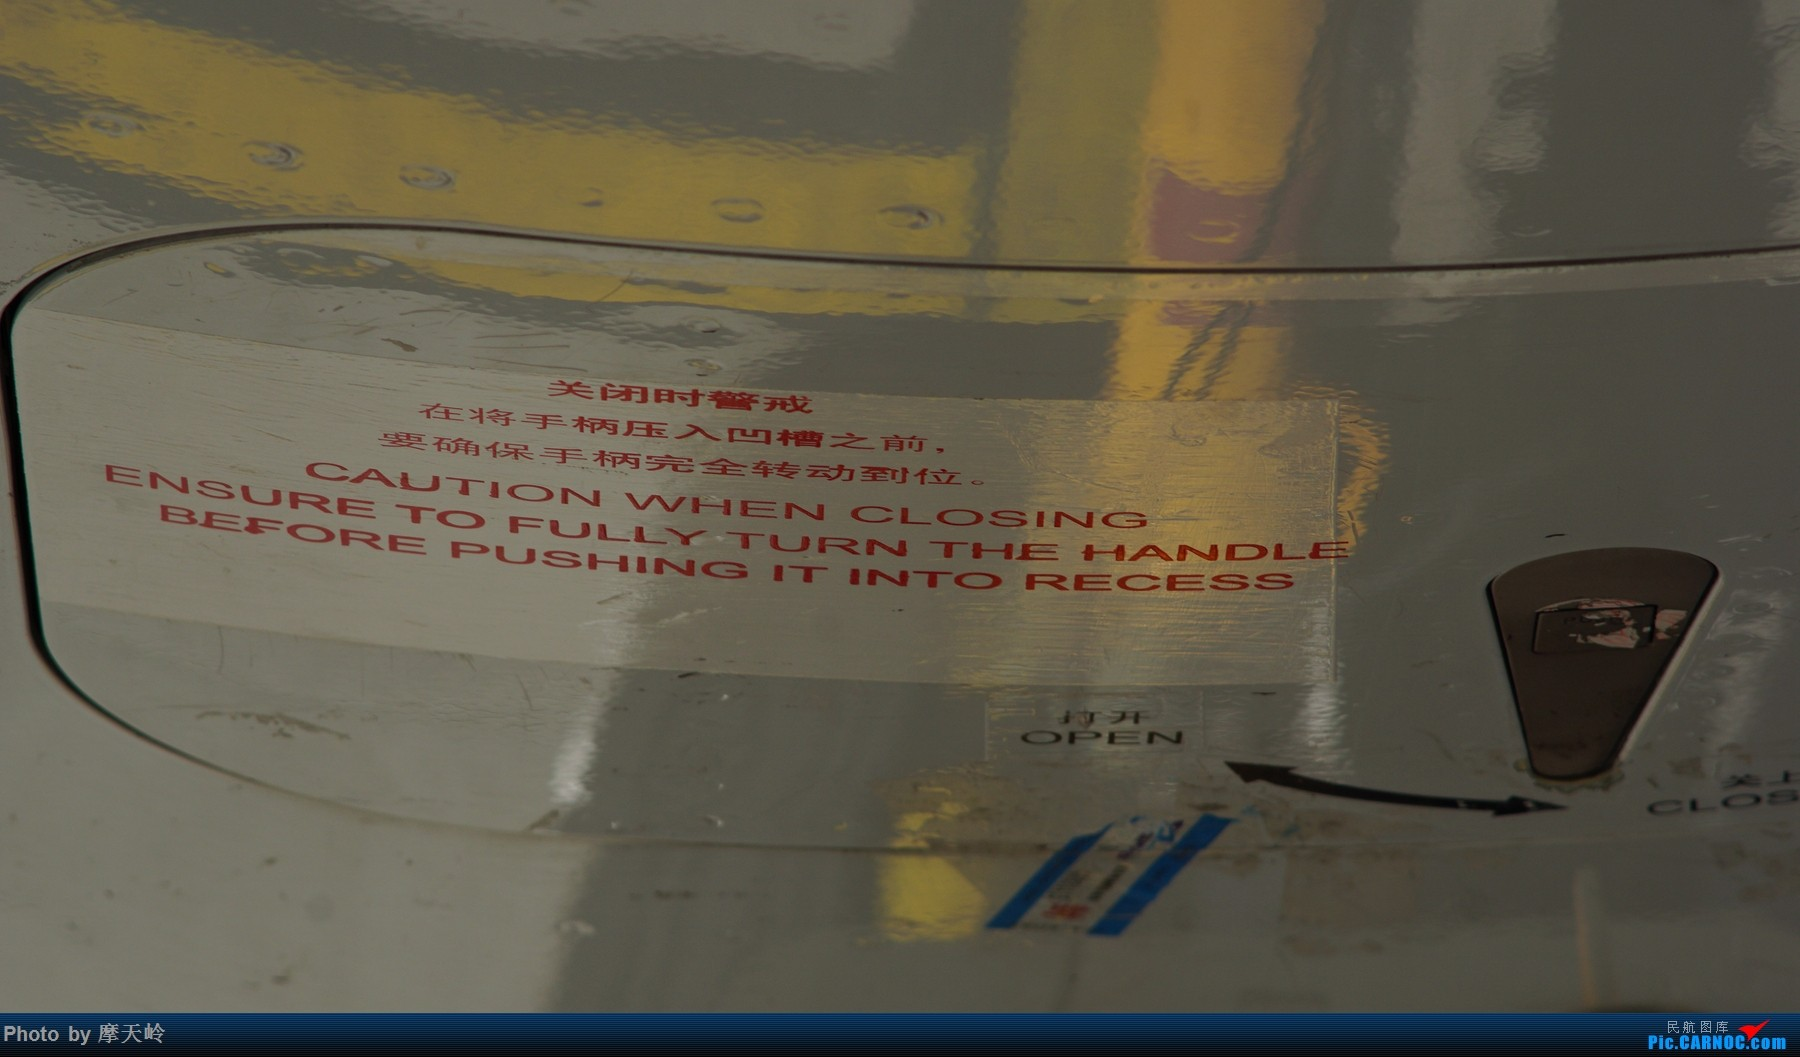 Re:[原创]【长水】春节期间拍机集 AIRBUS A320-200 B-1822 中国昆明长水国际机场